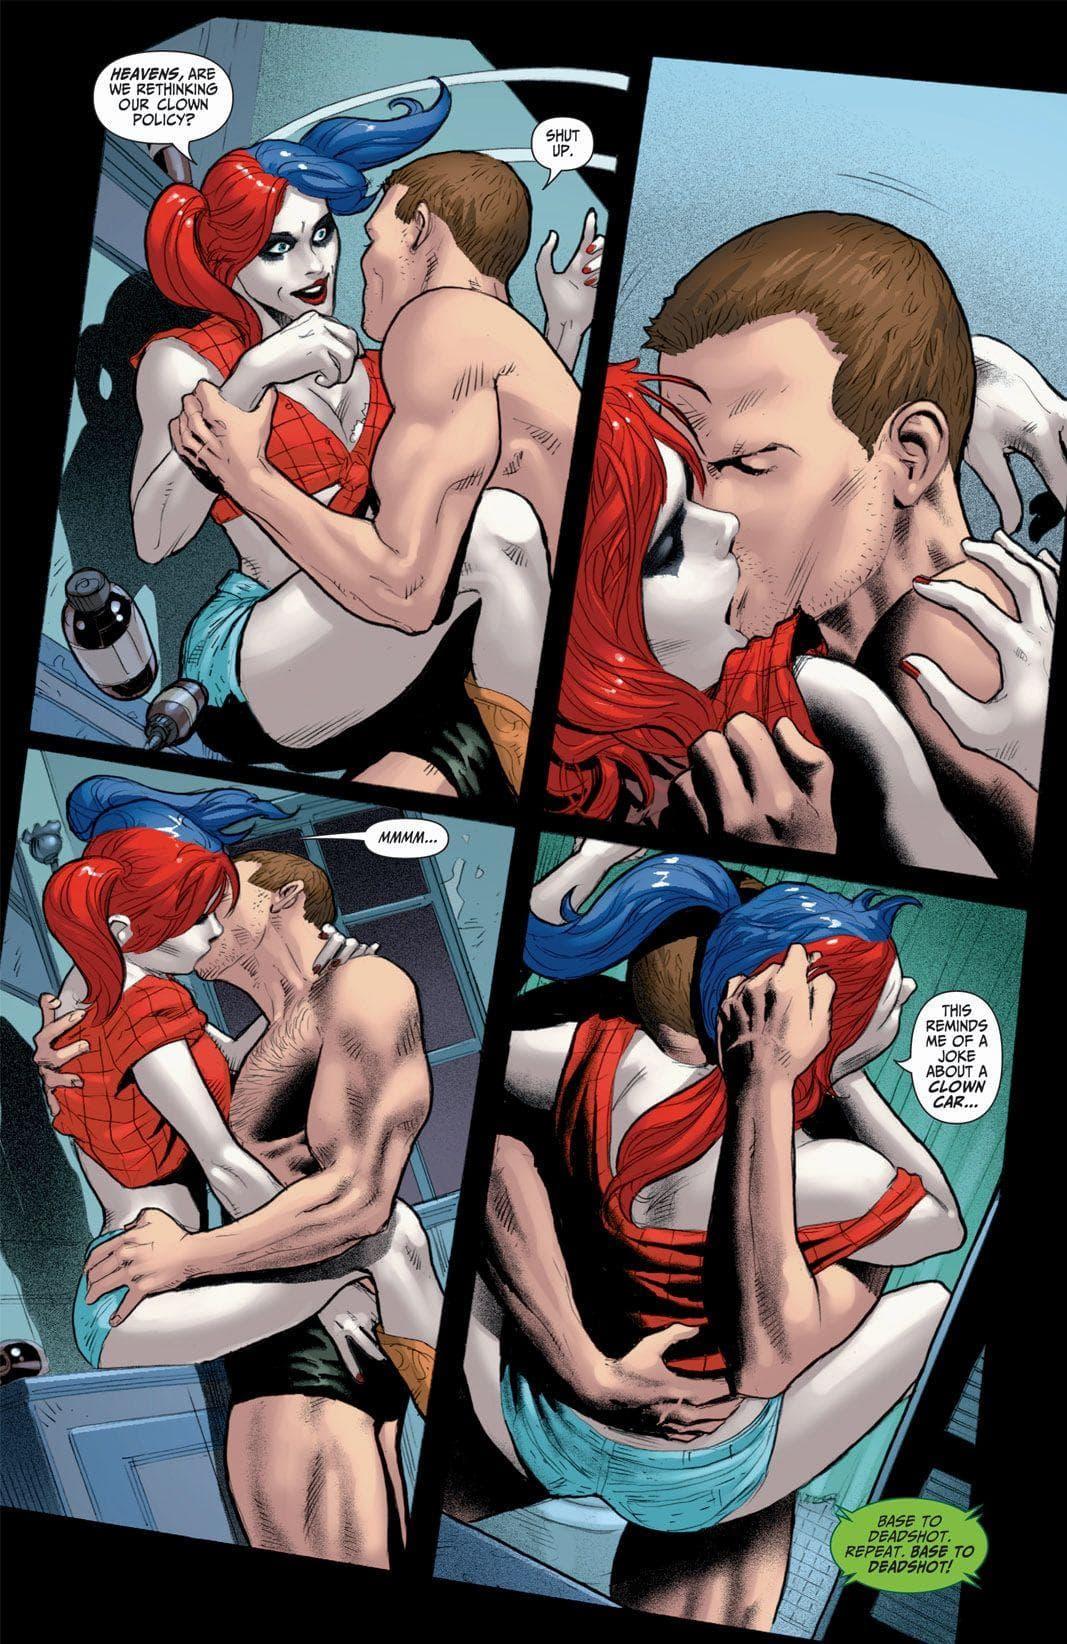 DC κόμικς πορνό κόμικς